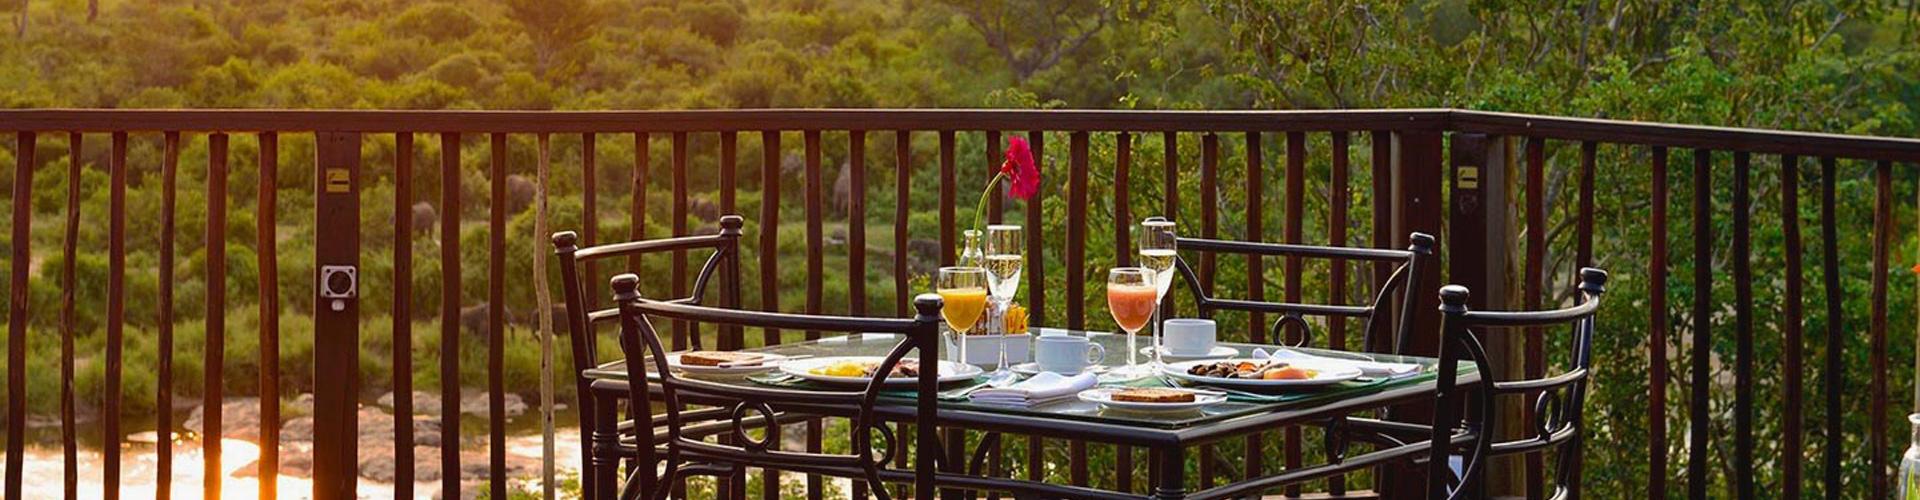 pestana-kruger-lodge-intimate-dining